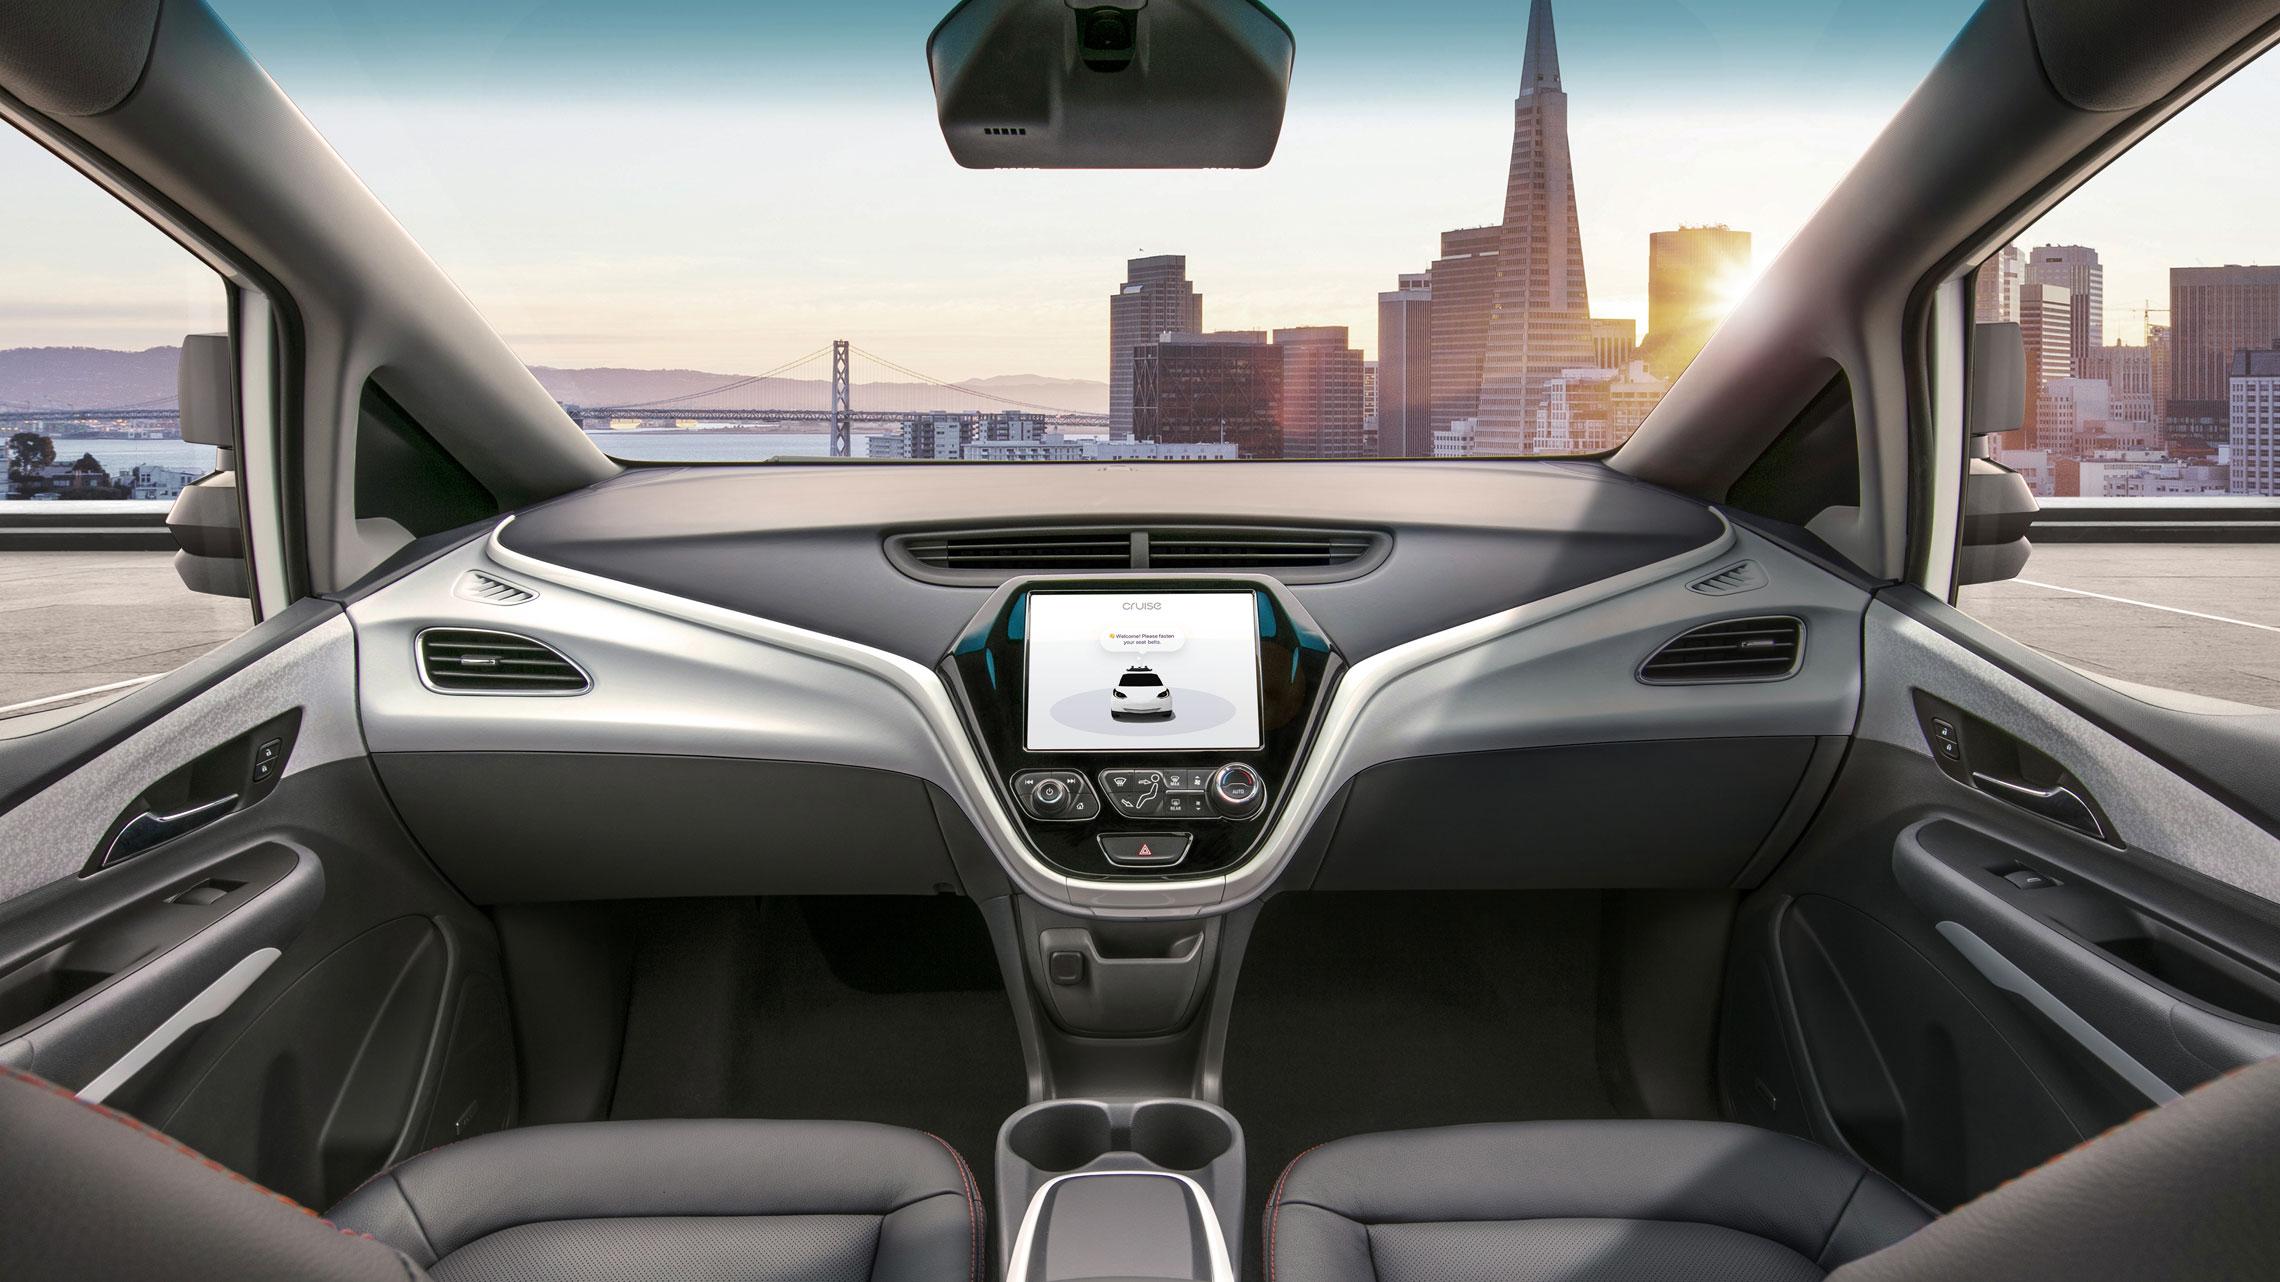 gm-waymo-selfdriving-car